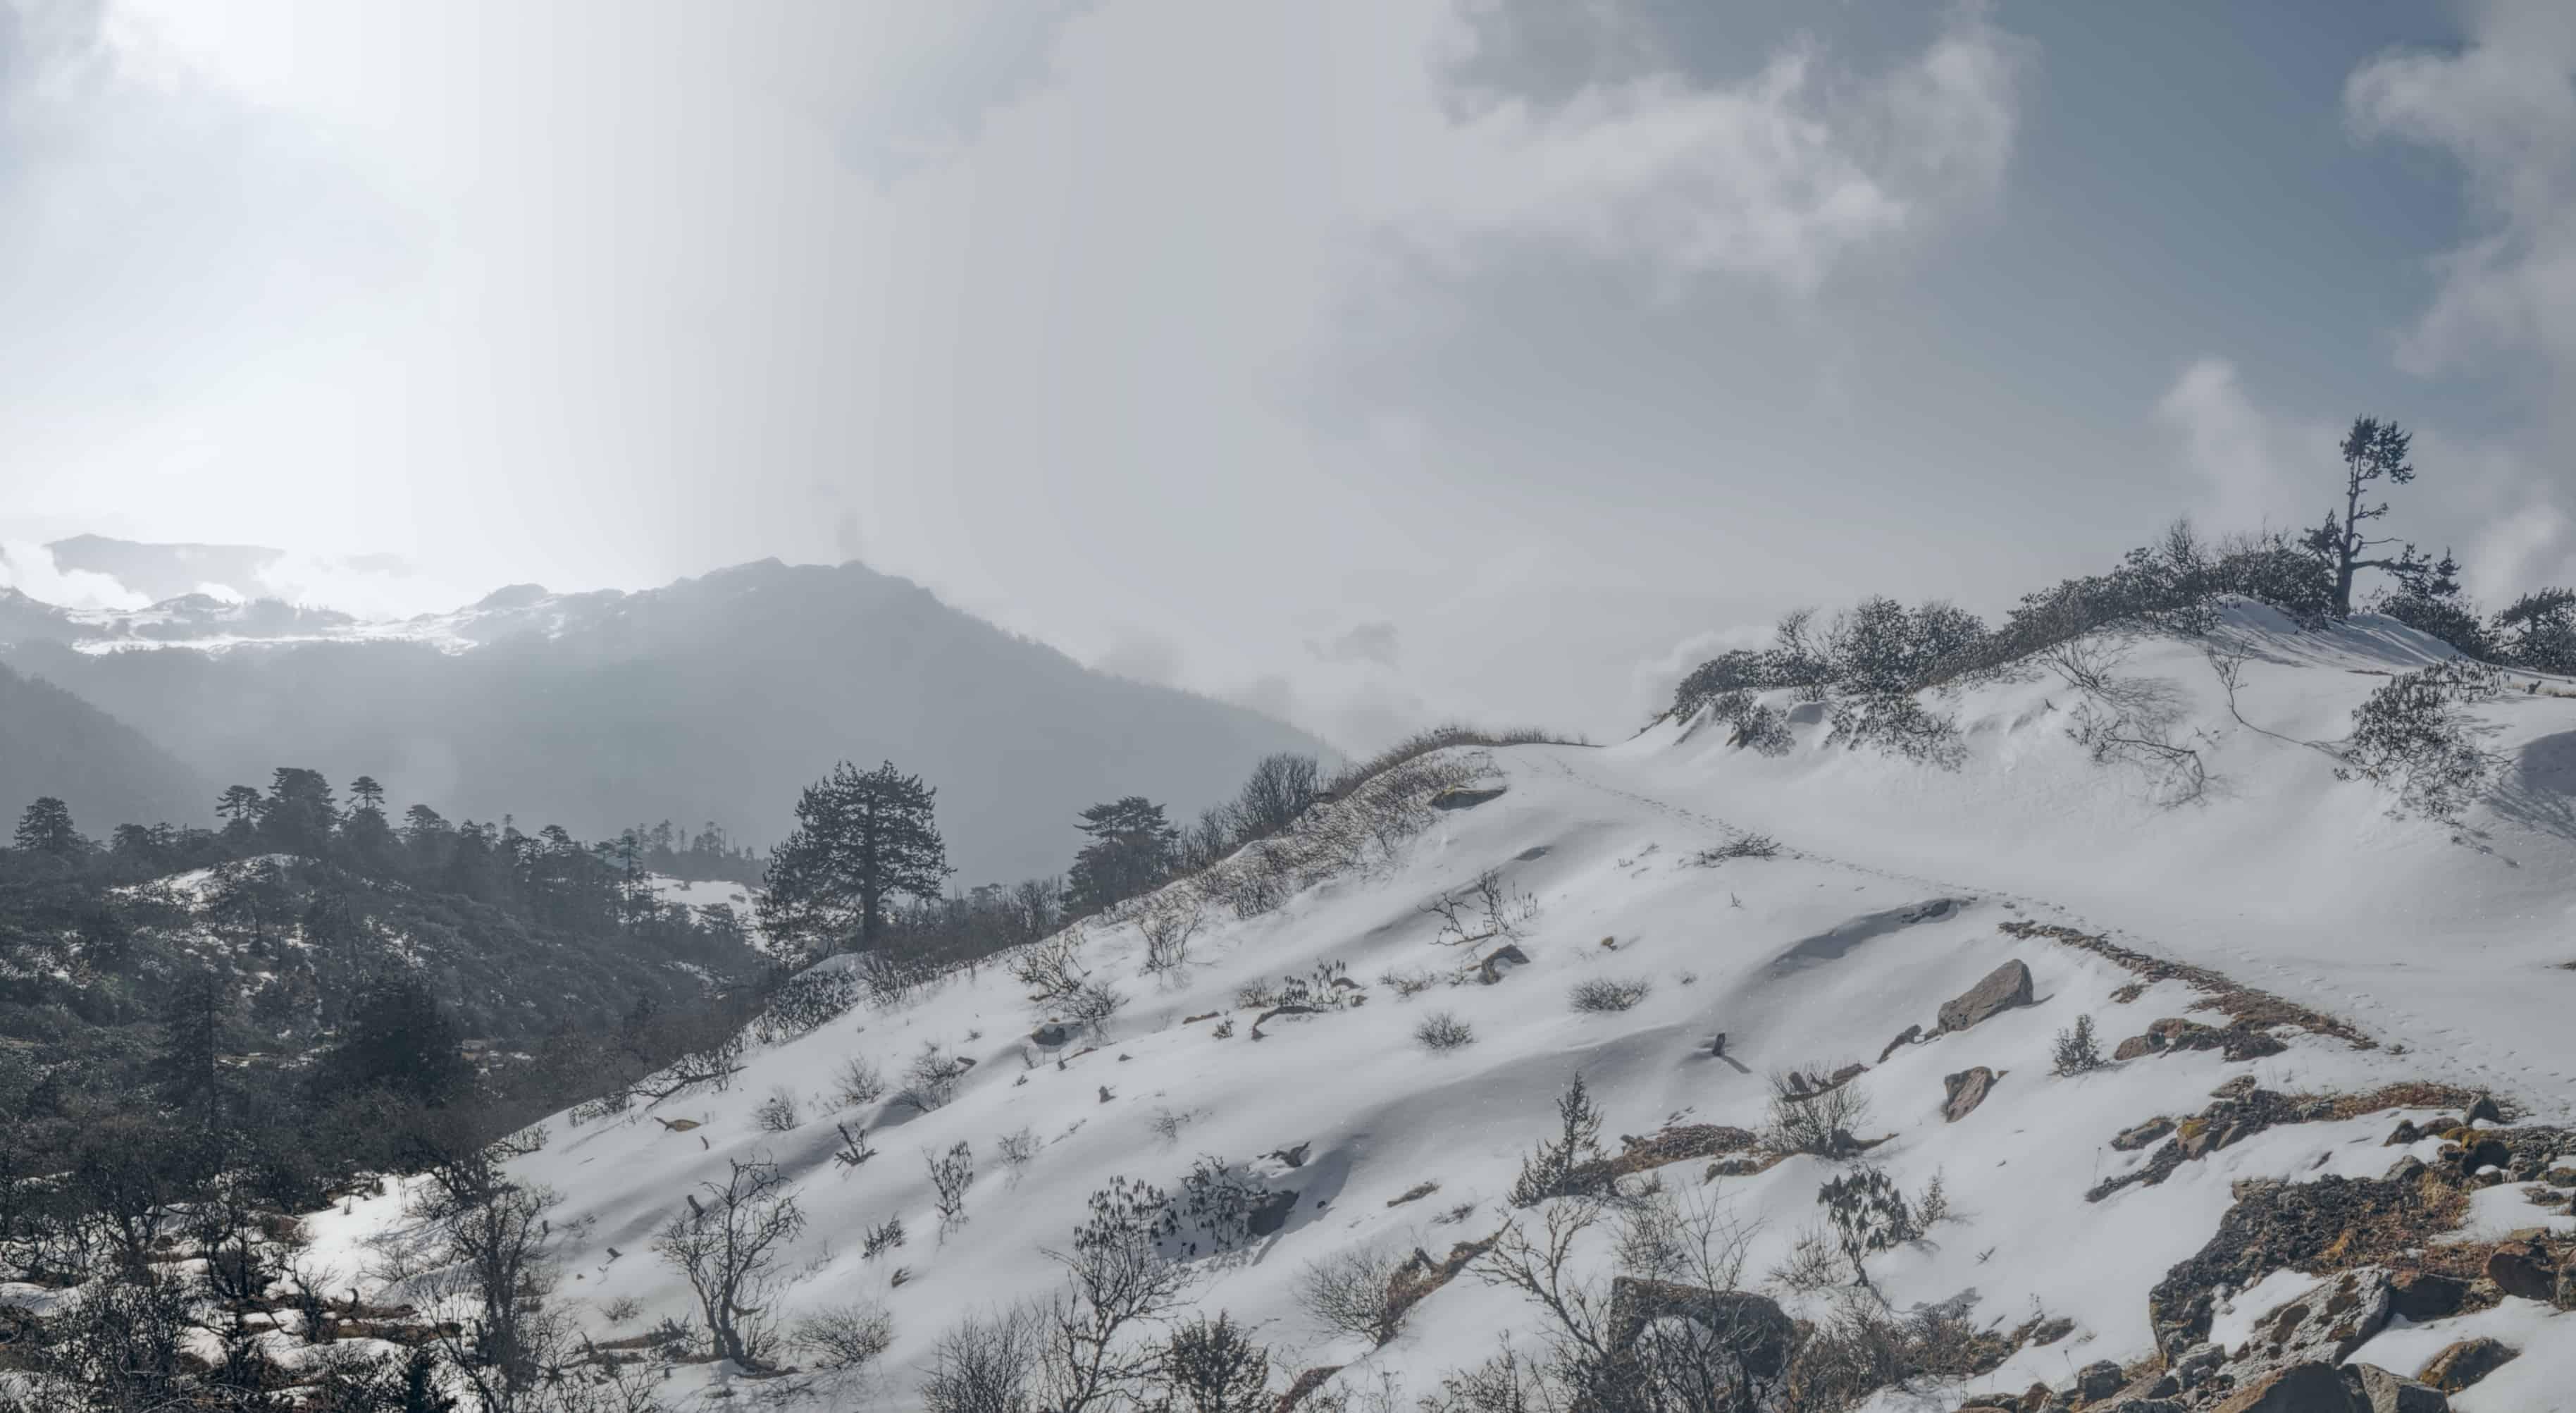 Arunachal Pradesh Snowfall